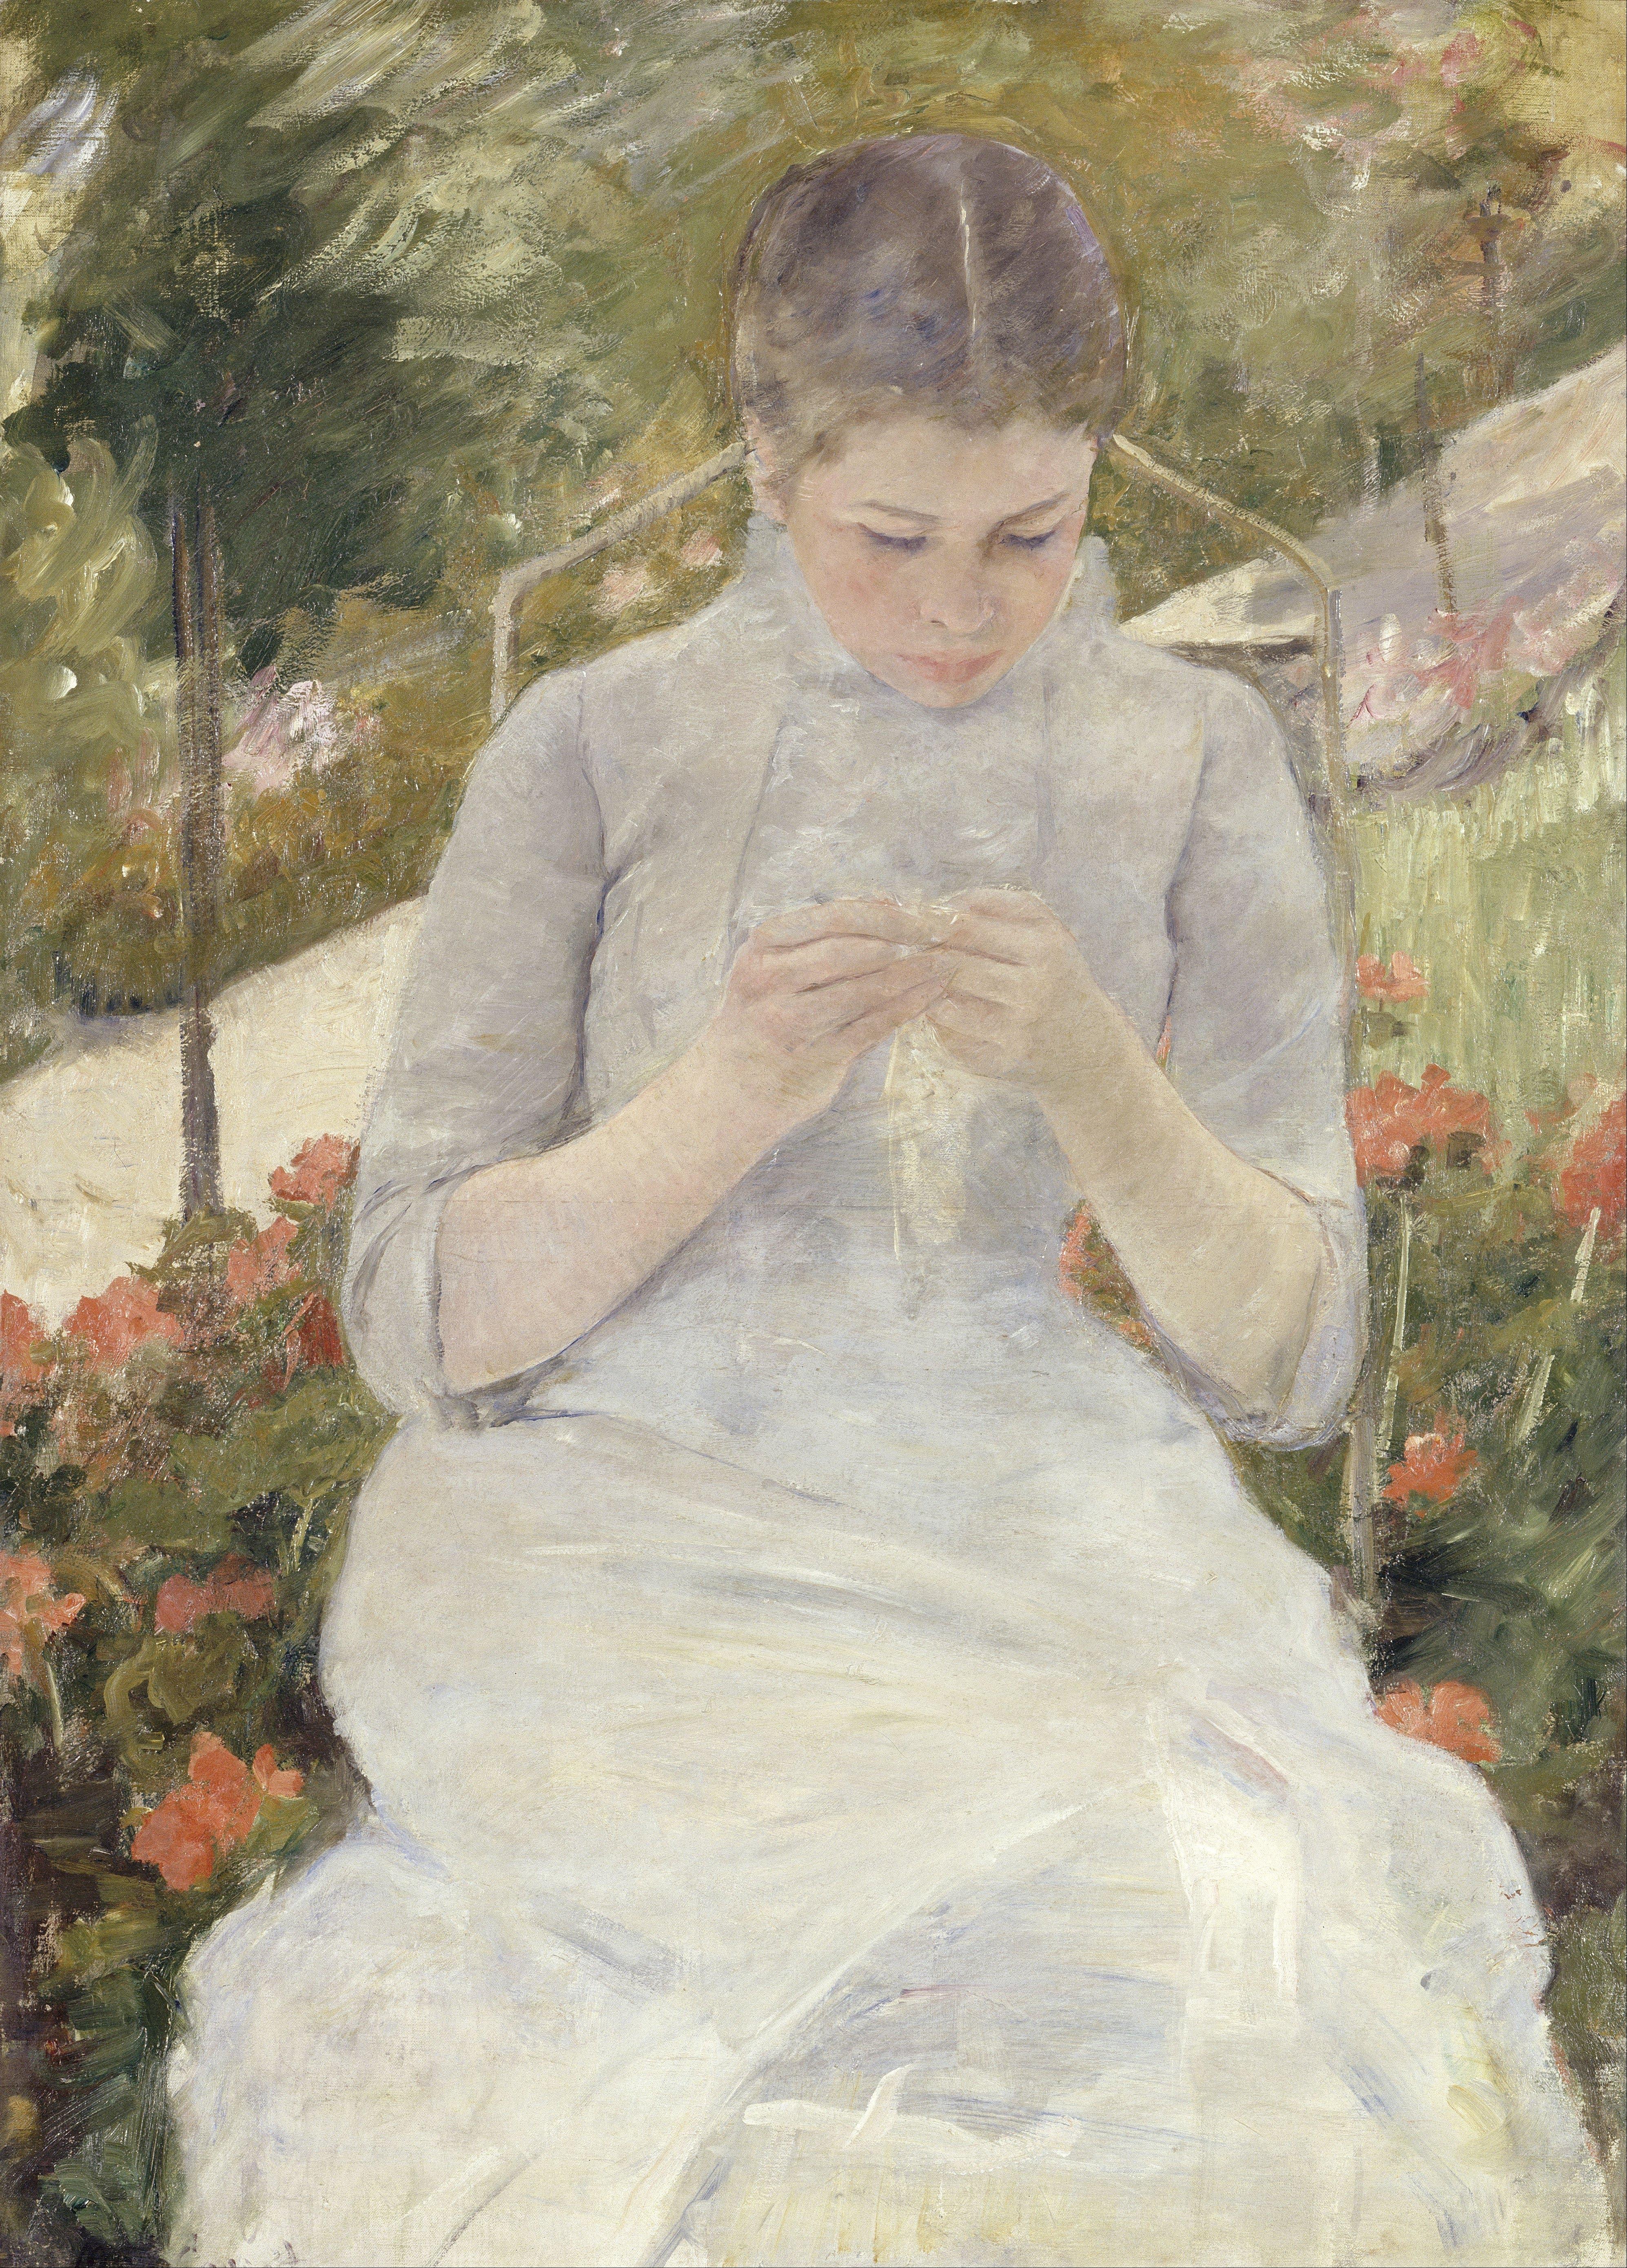 filemary cassatt girl in the garden google art projectjpg - The Girls In The Garden